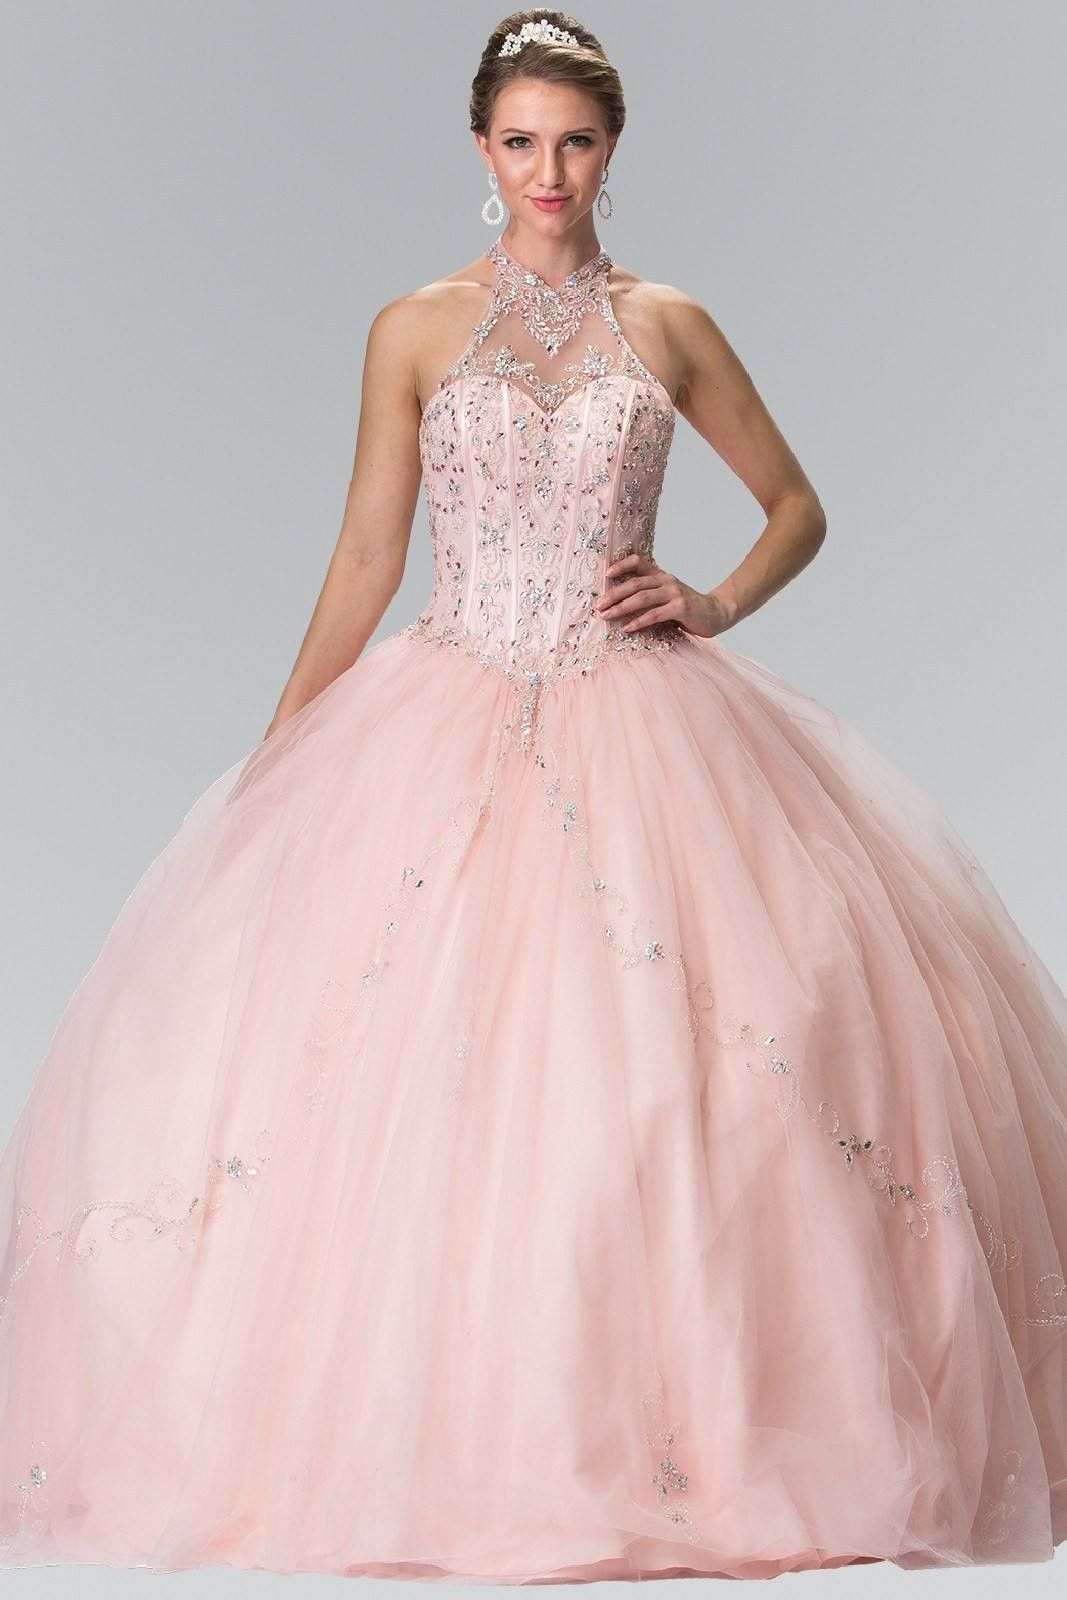 Pink Quinceanera sweet 15 dress gl2348pk | Quinceanera ideas ...